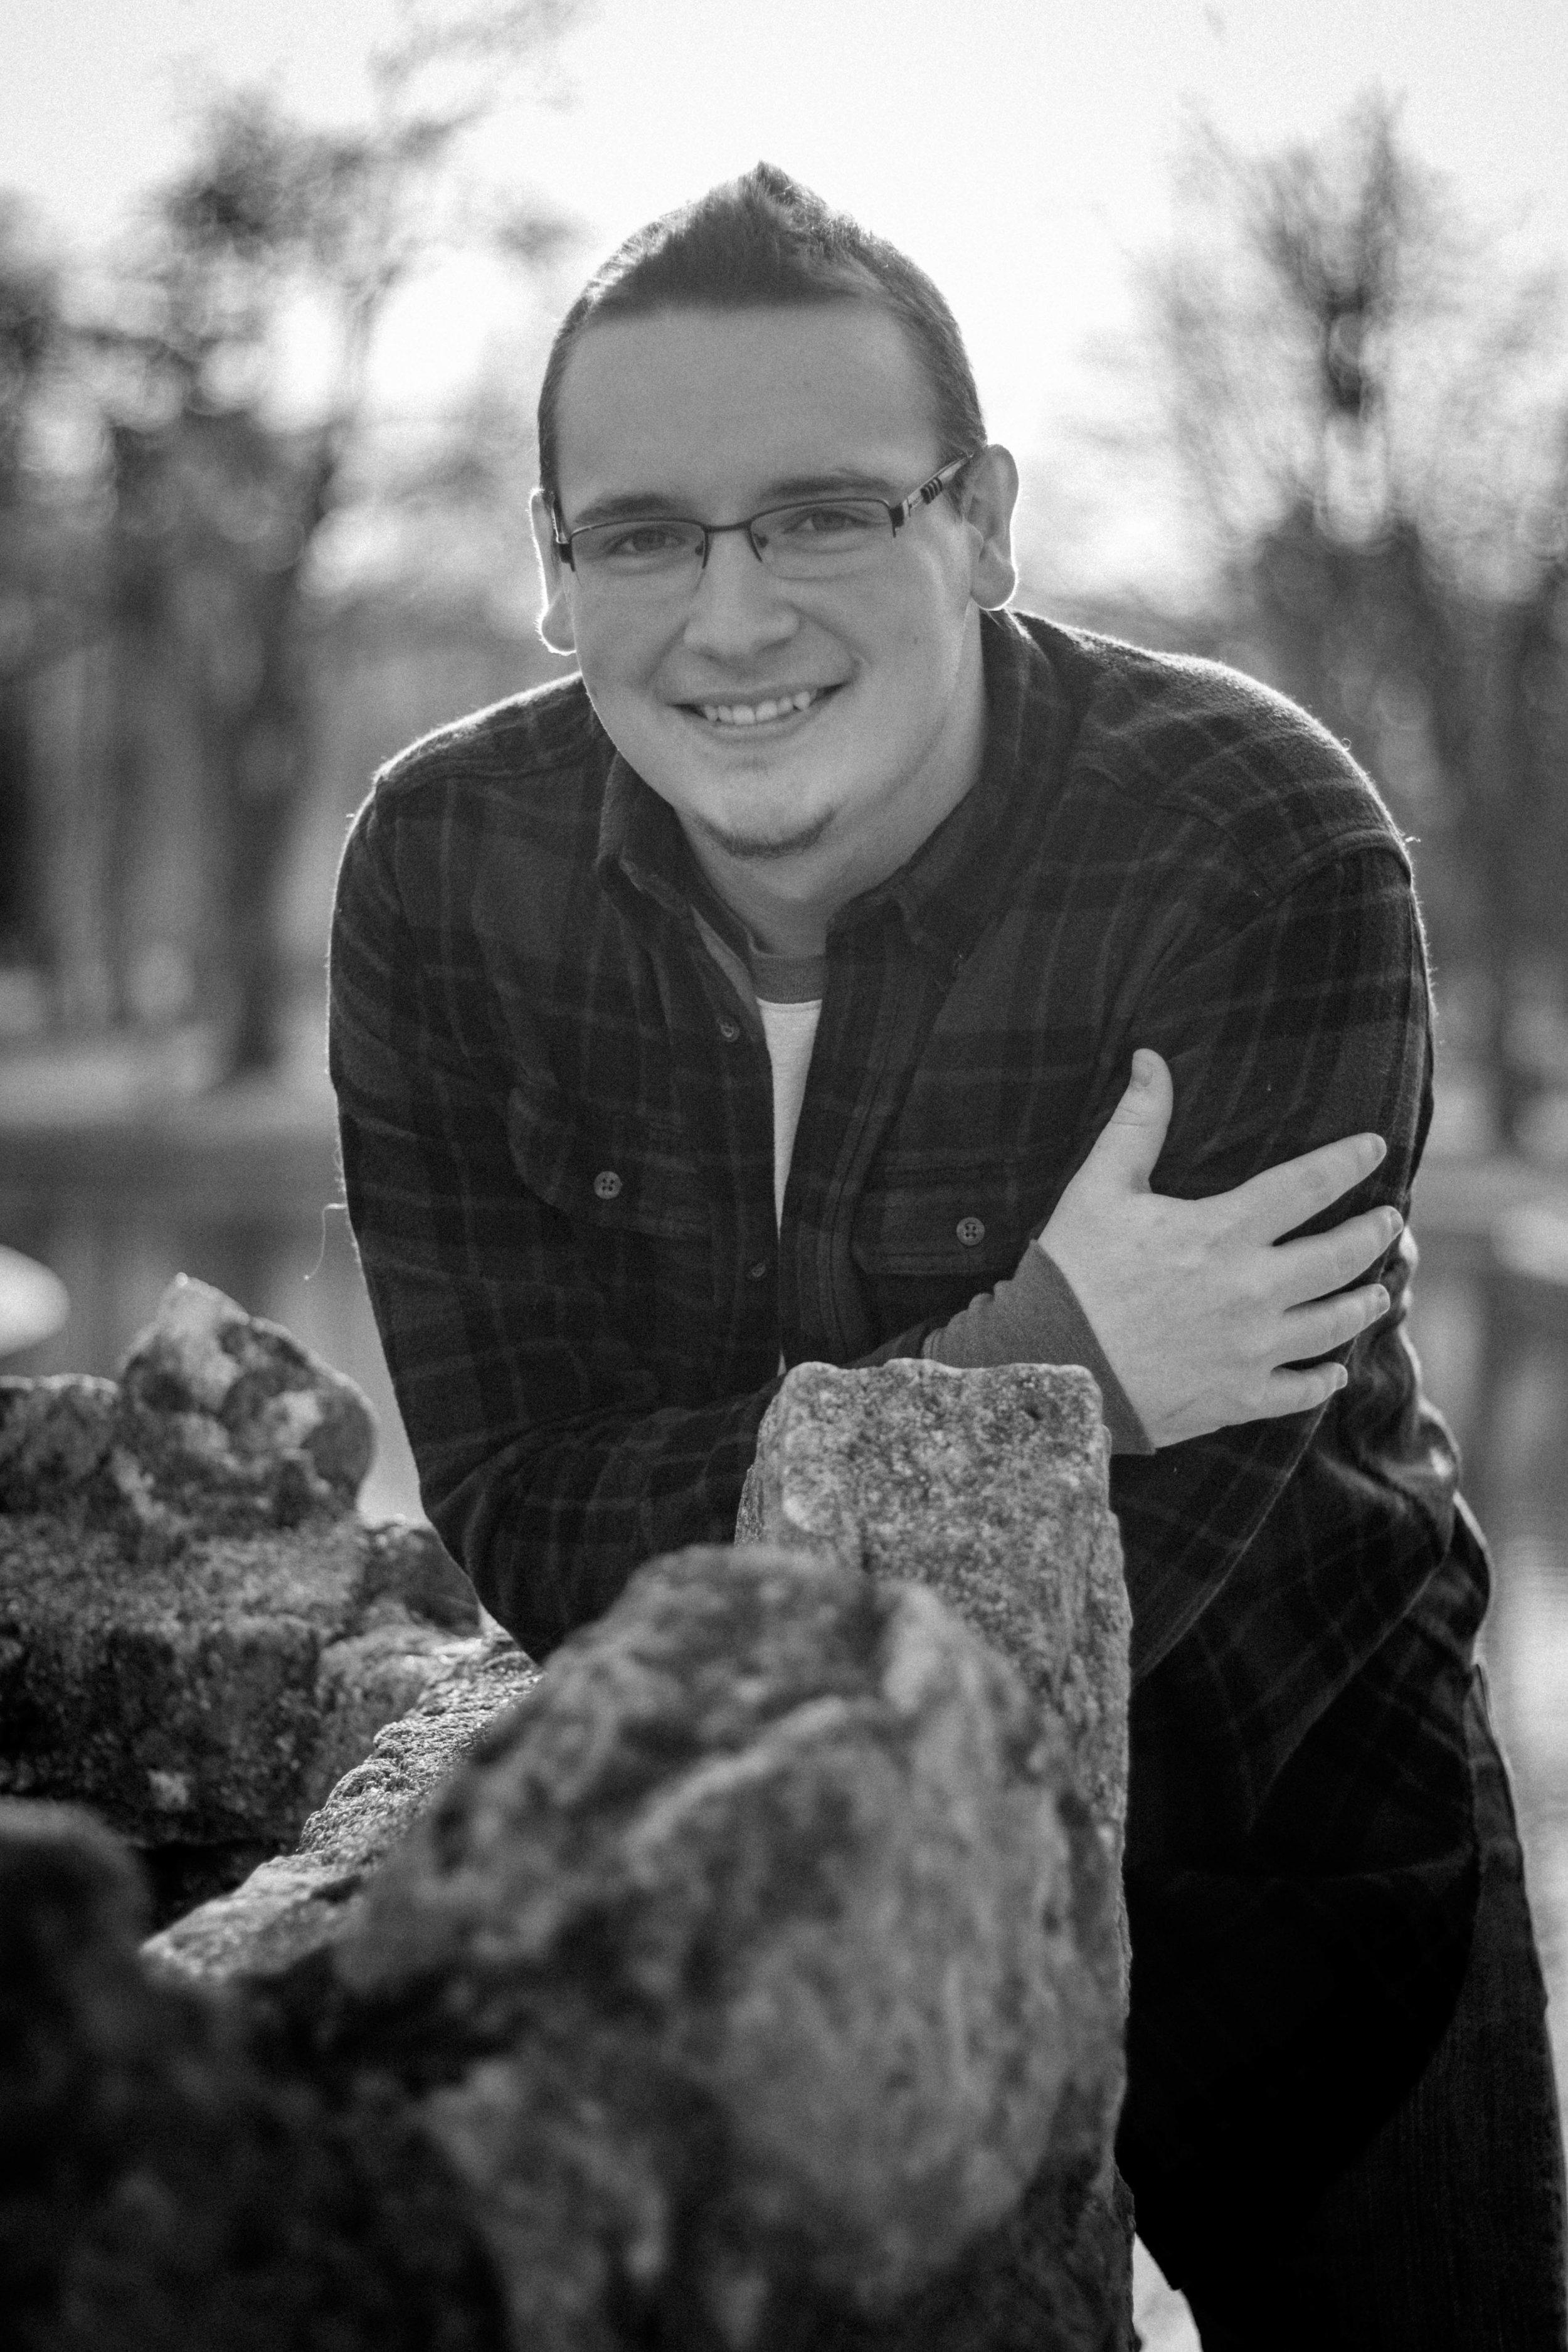 Greenville City Park Senior Portraits | Greenville, Ohio Photographer